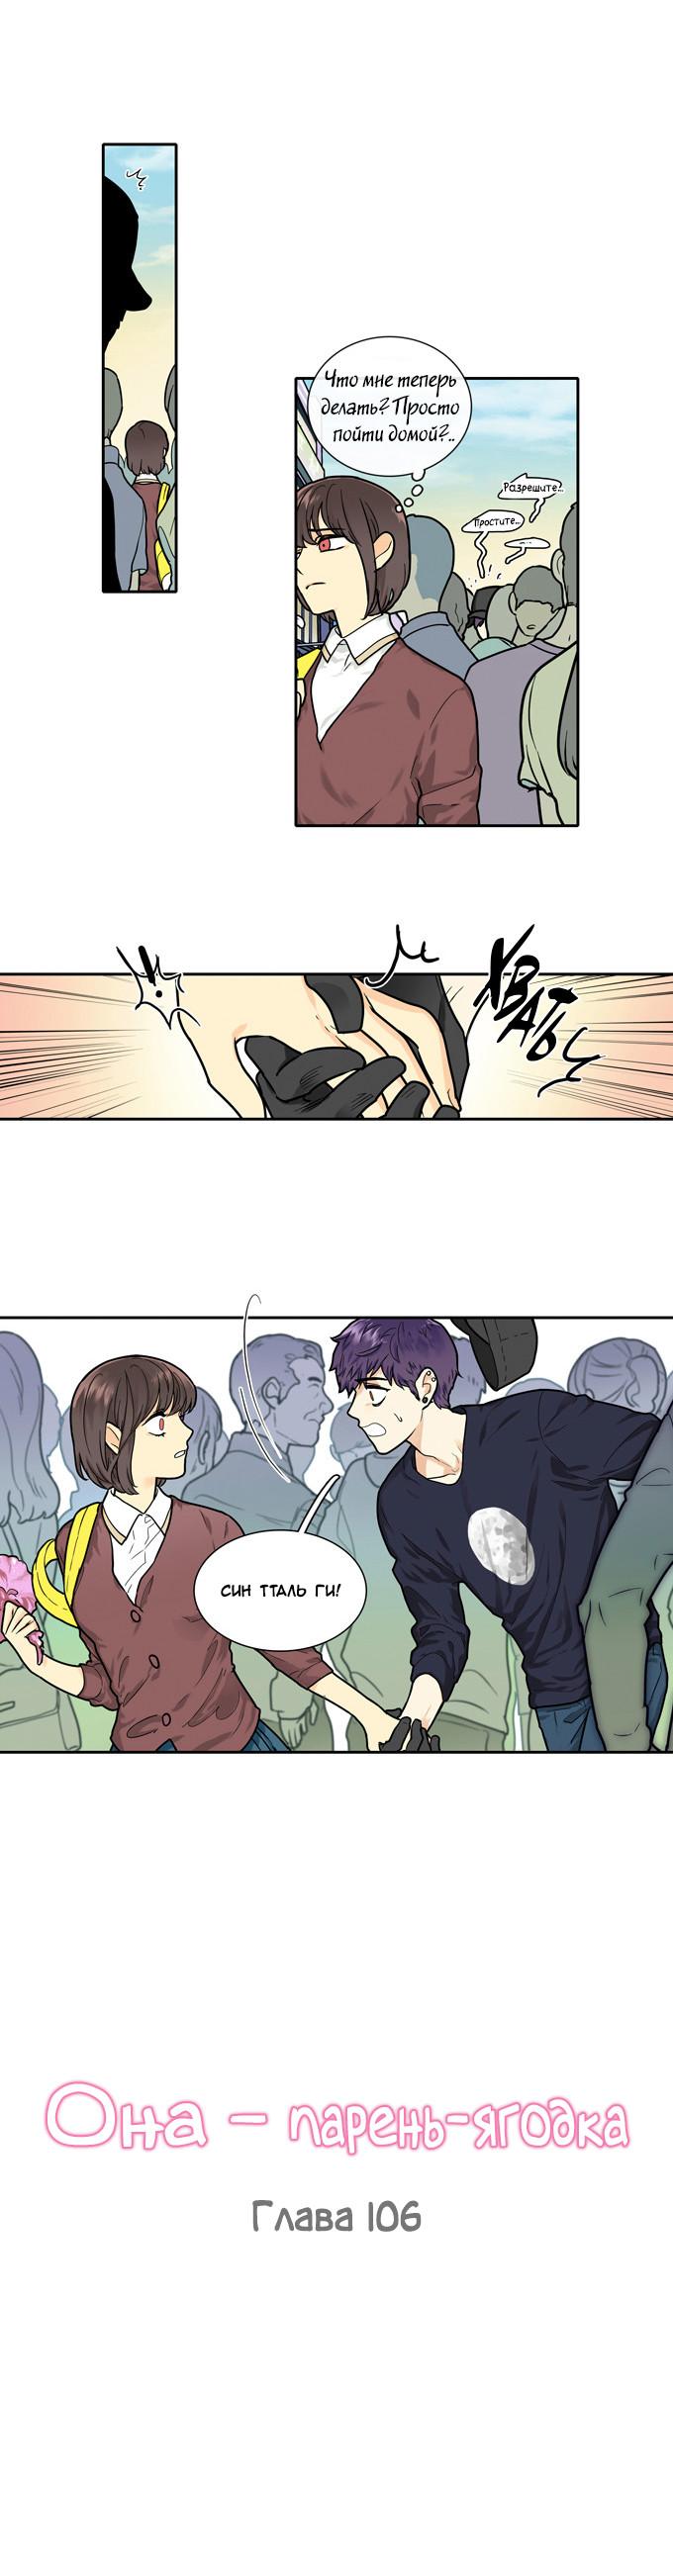 https://r1.ninemanga.com/comics/pic2/41/21609/314355/1481656524531.jpg Page 3